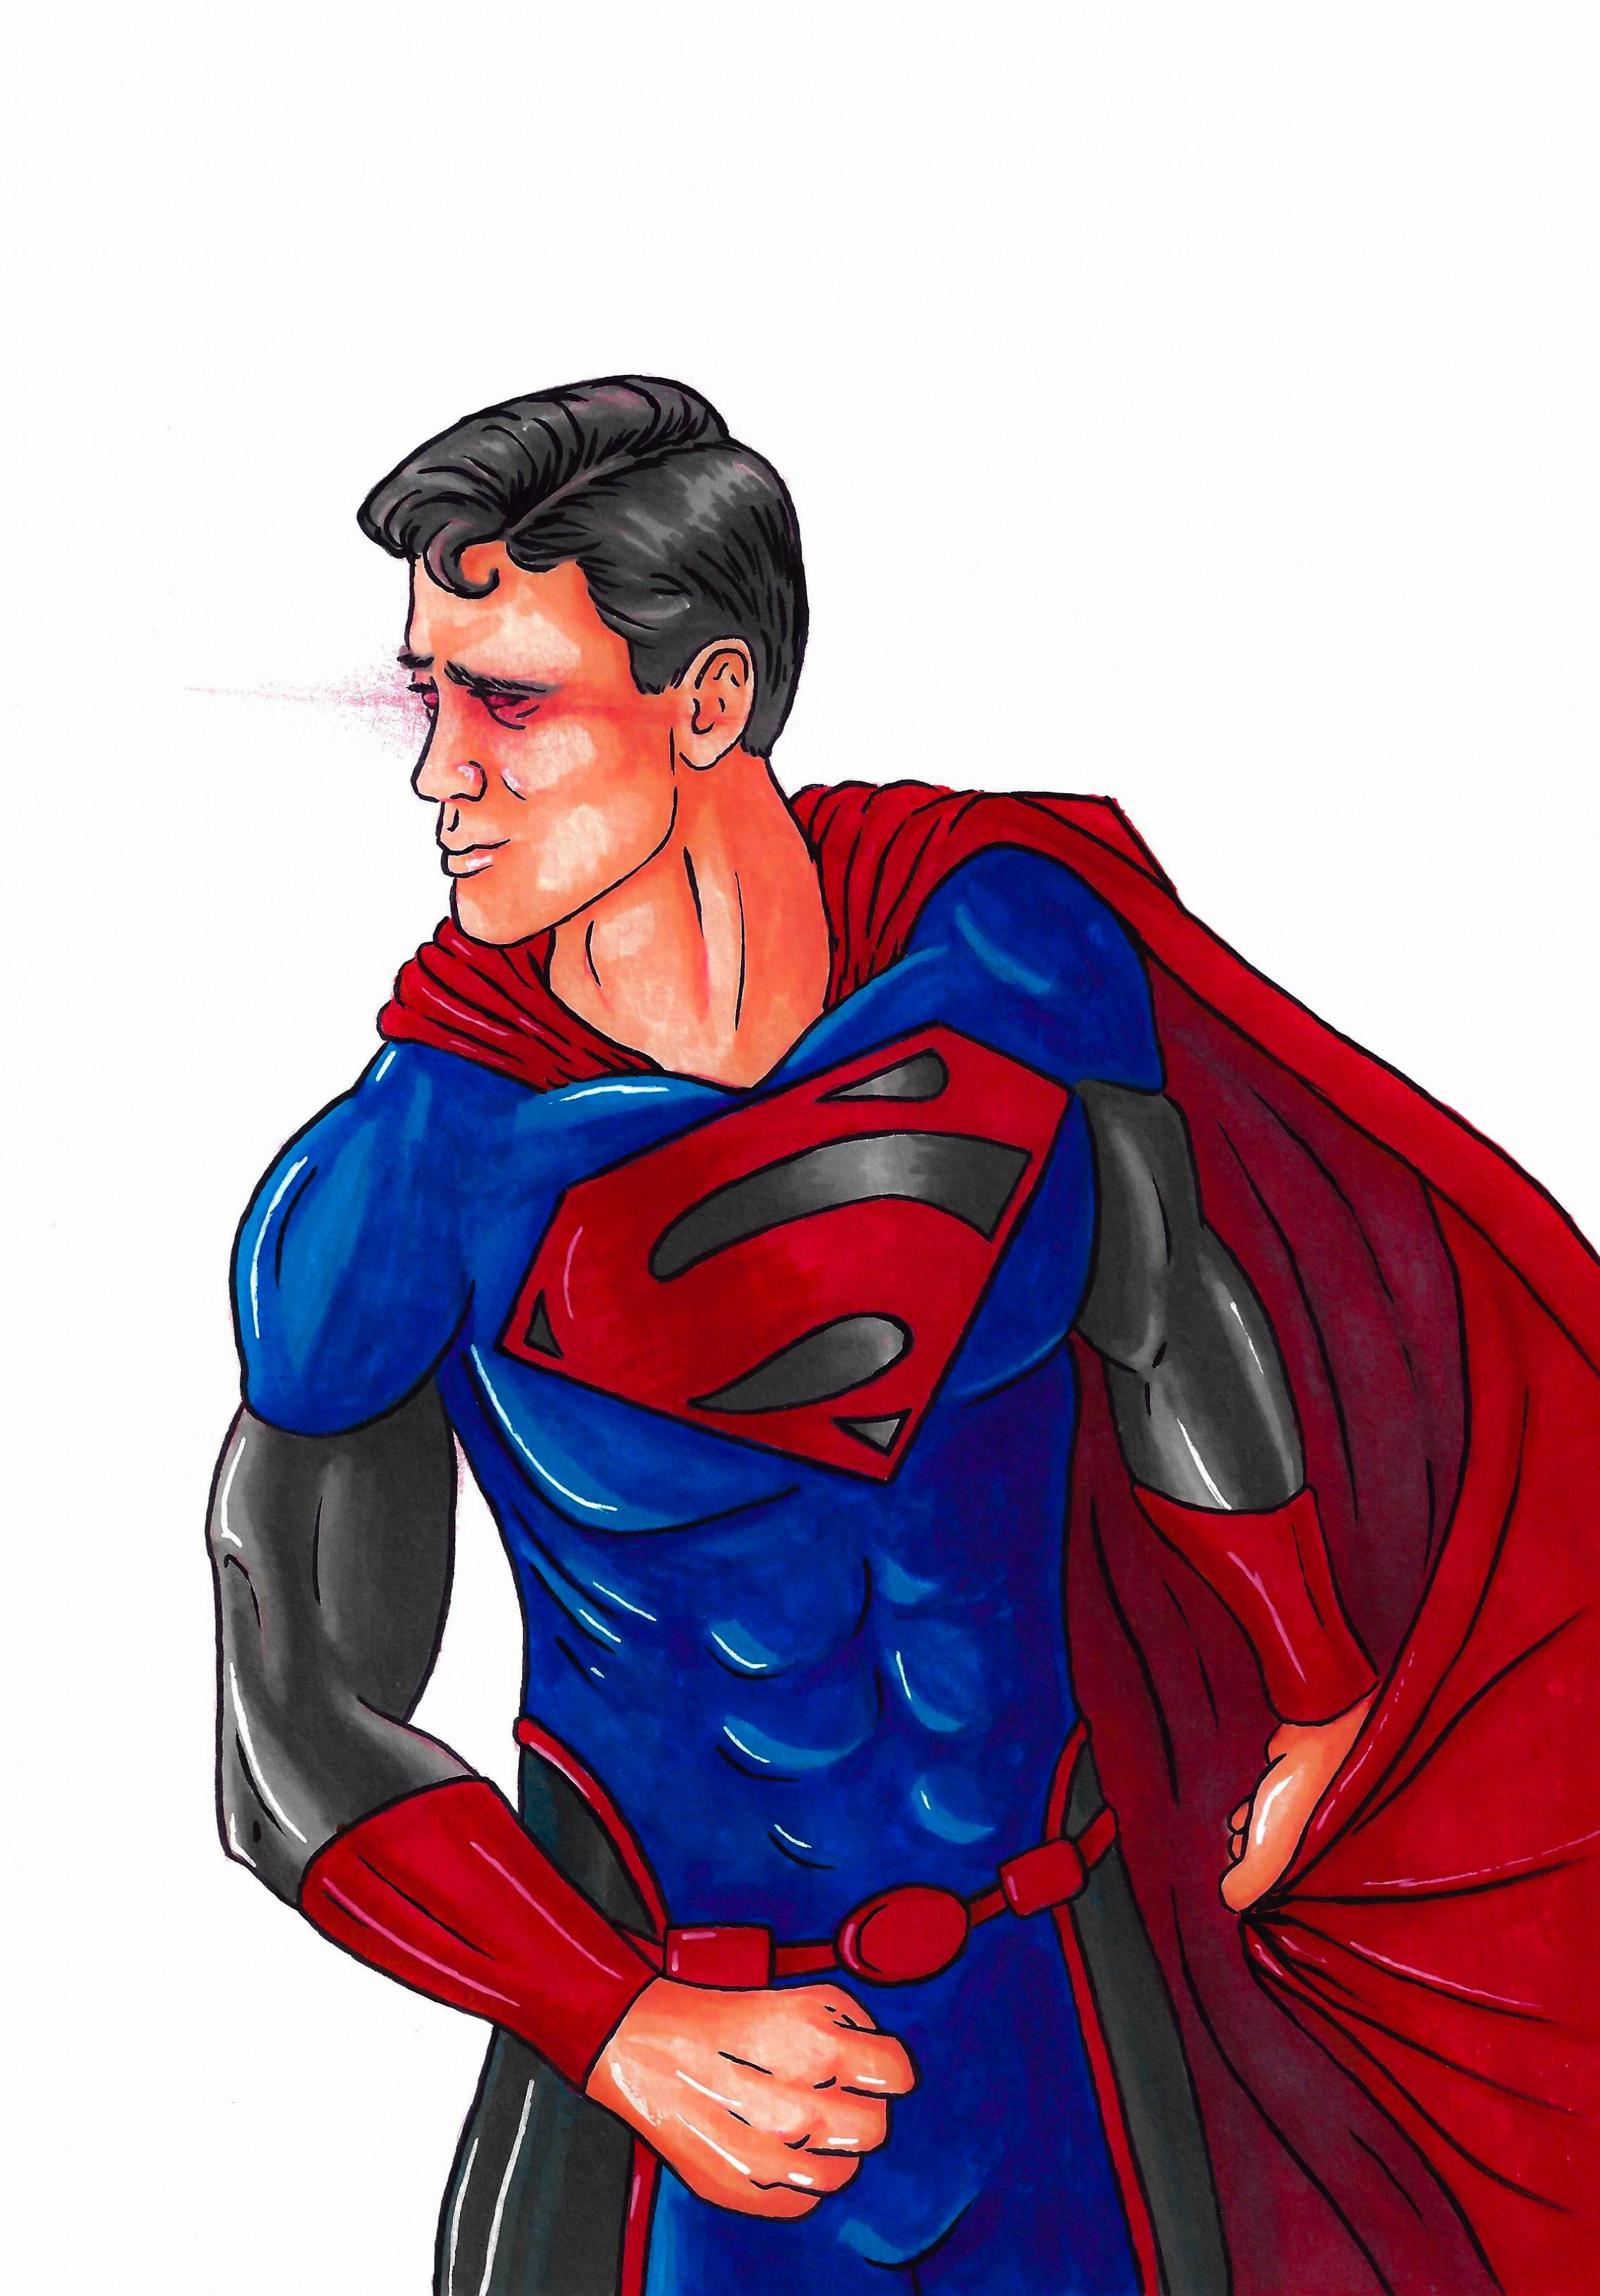 Super Man fan art. Original costume design